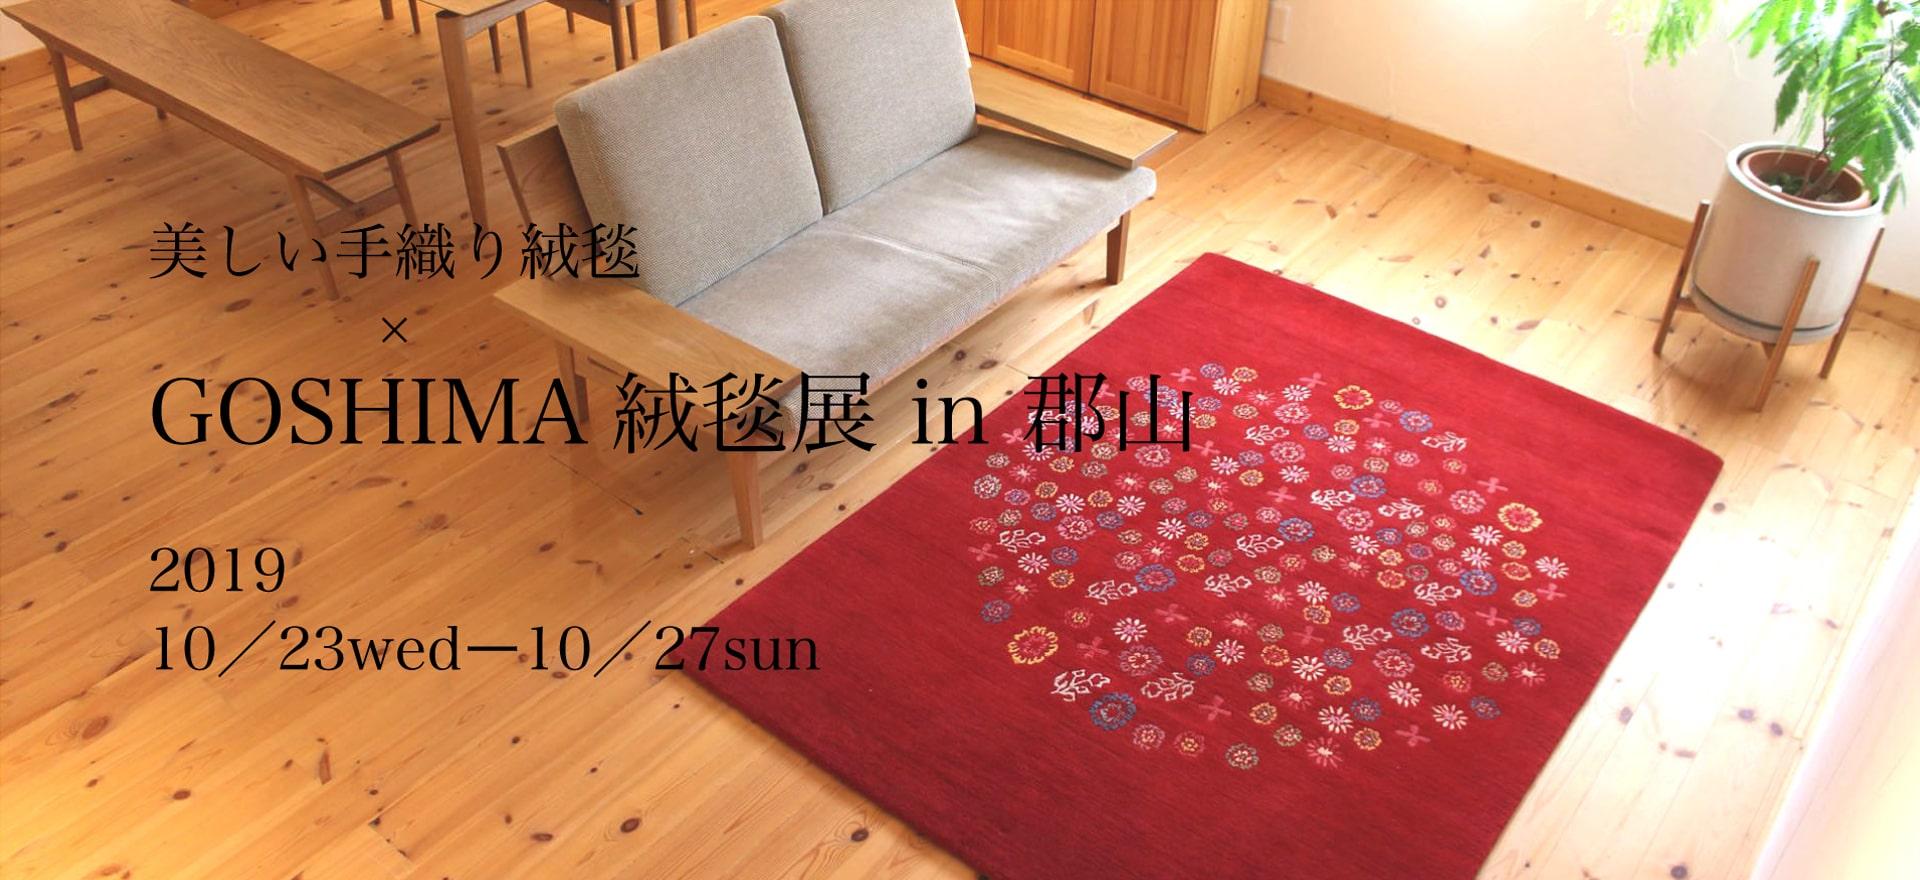 GOSHIMA絨毯展 in 郡山